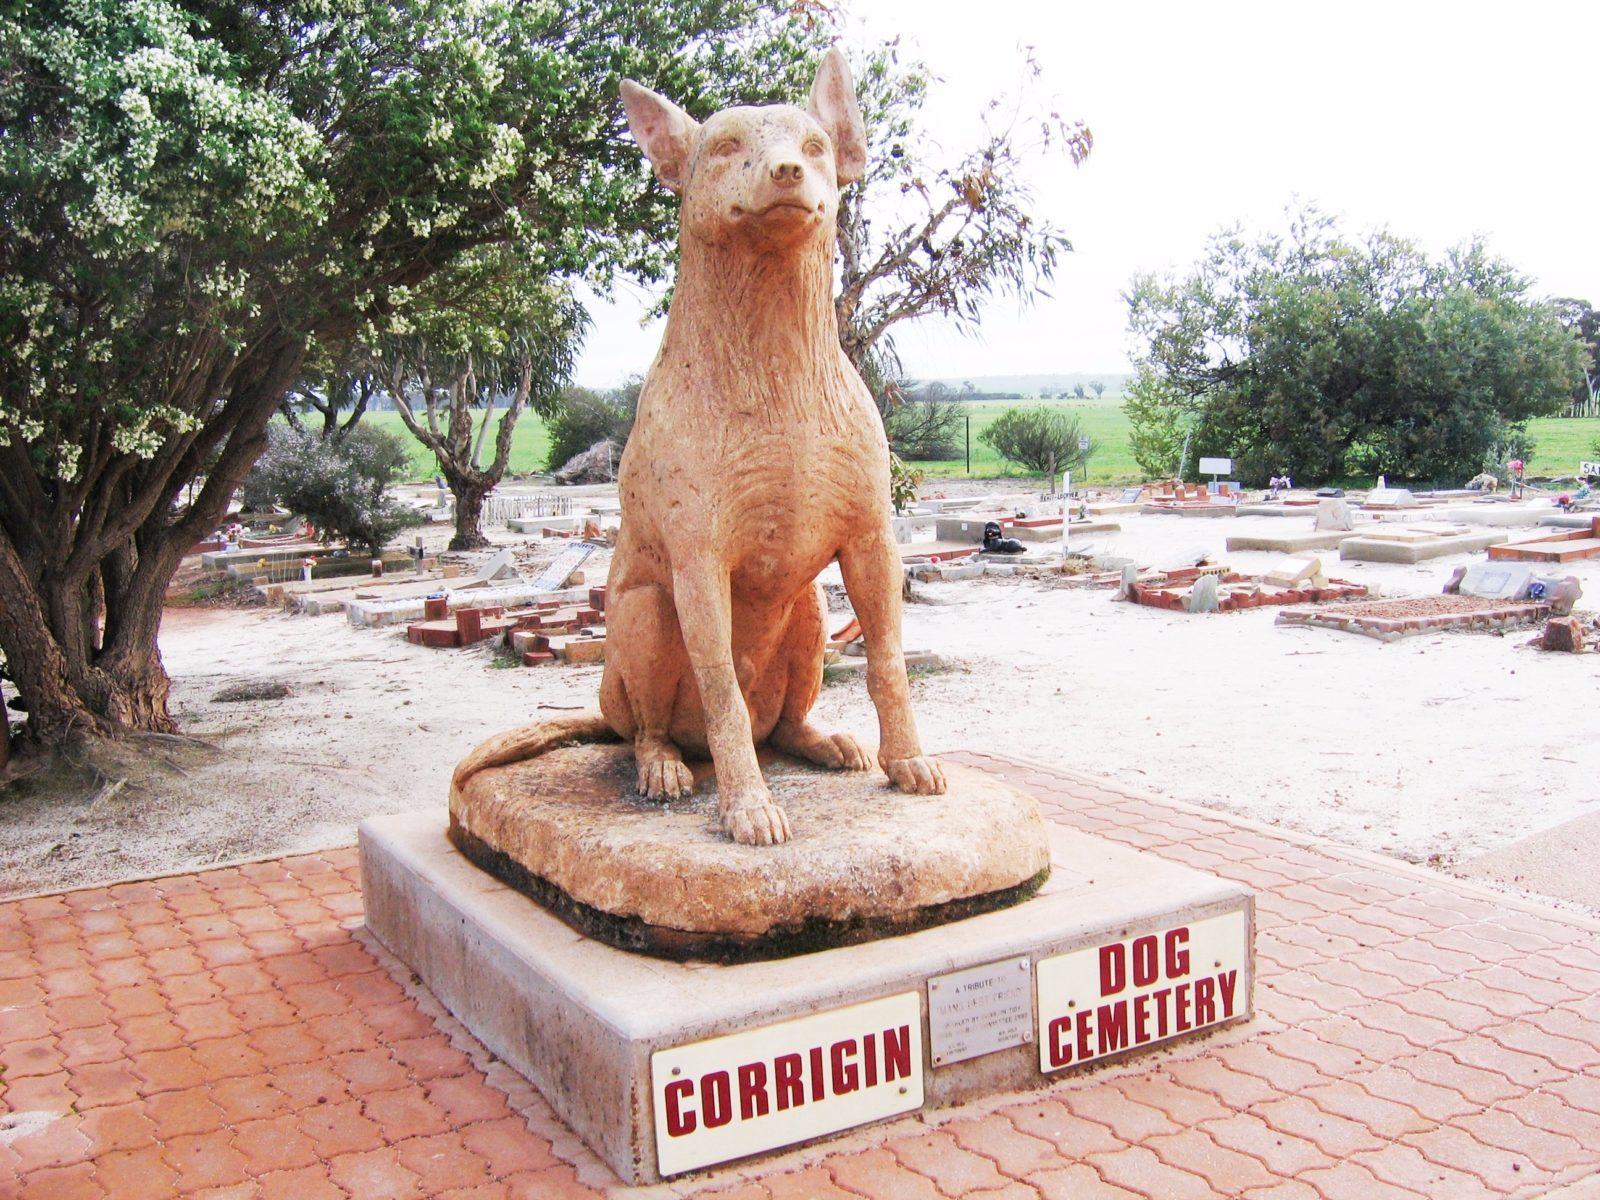 Corrigin Dog Cemetery, Corrigin, Western Australia